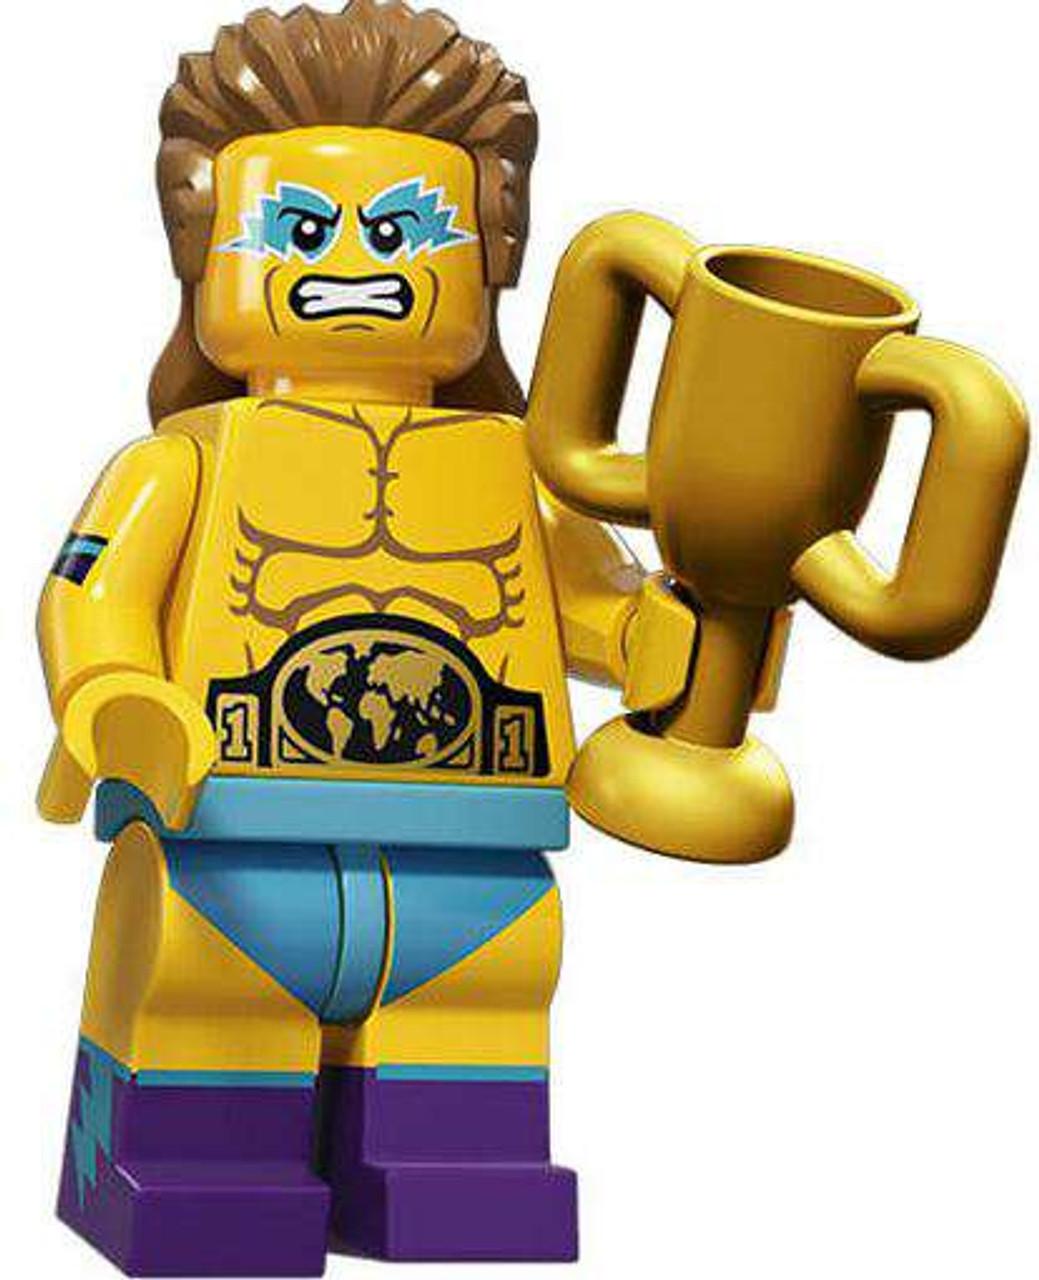 NEW LEGO Mini figure Wrestler Minifigures Series 15